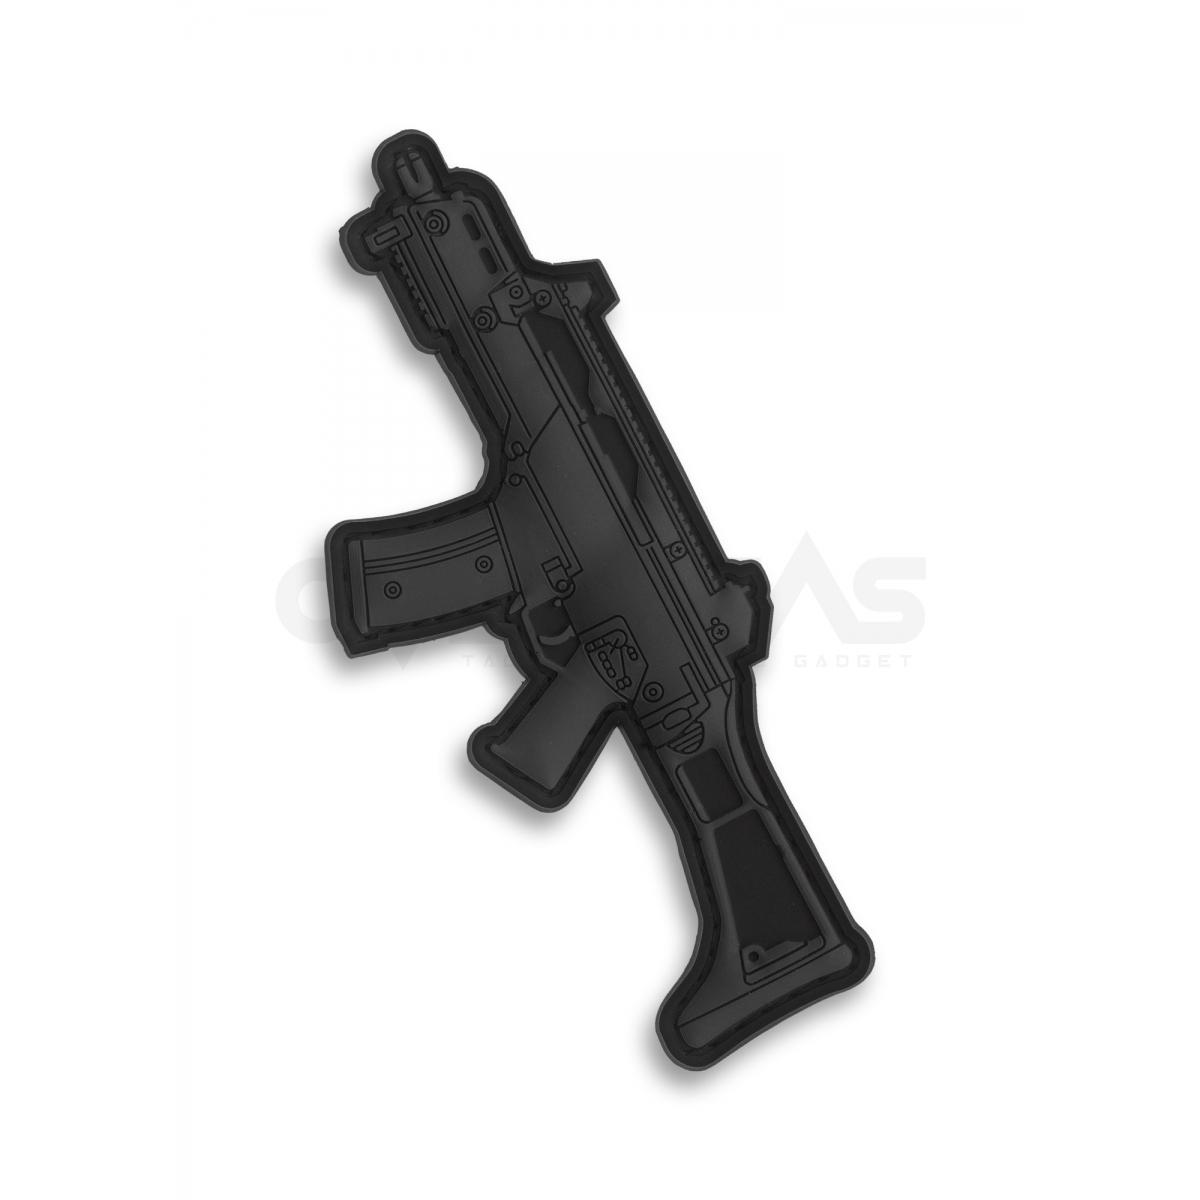 Guerilla Patch Heckler & Koch G36 Assault Rifle PVC Patch Black,G36-BLACK